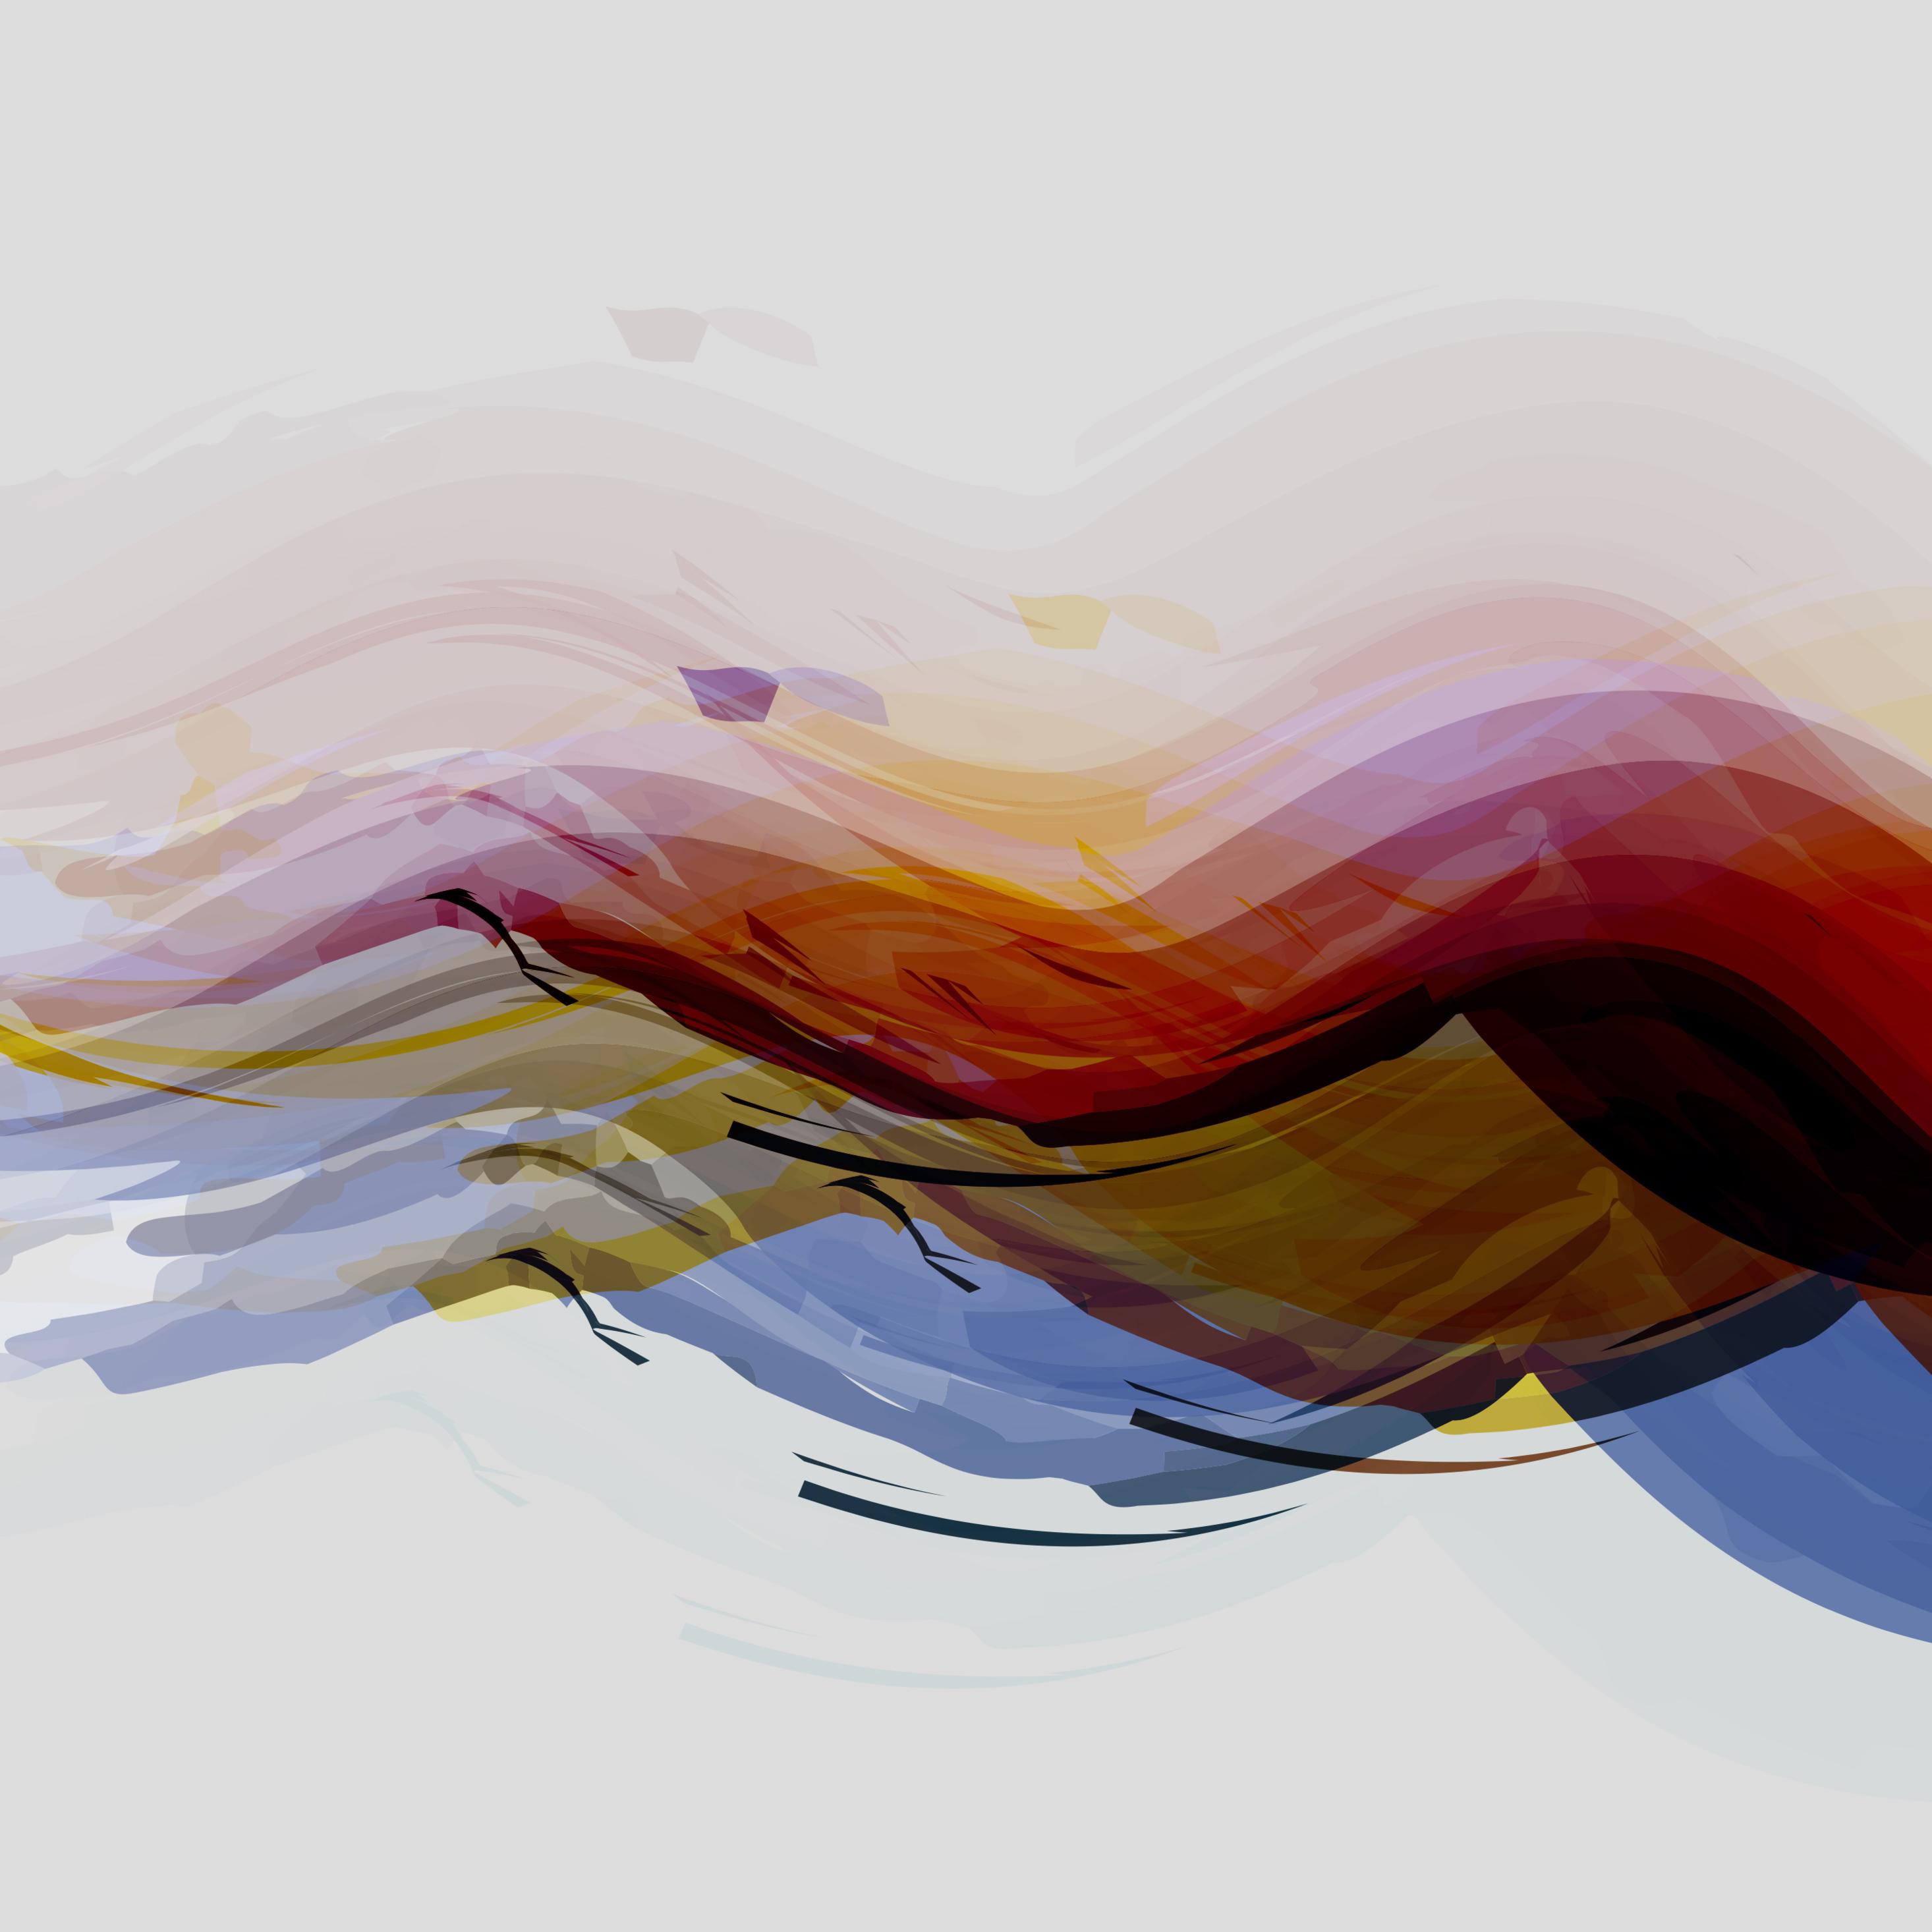 waves-of-color-5k-qu.jpg